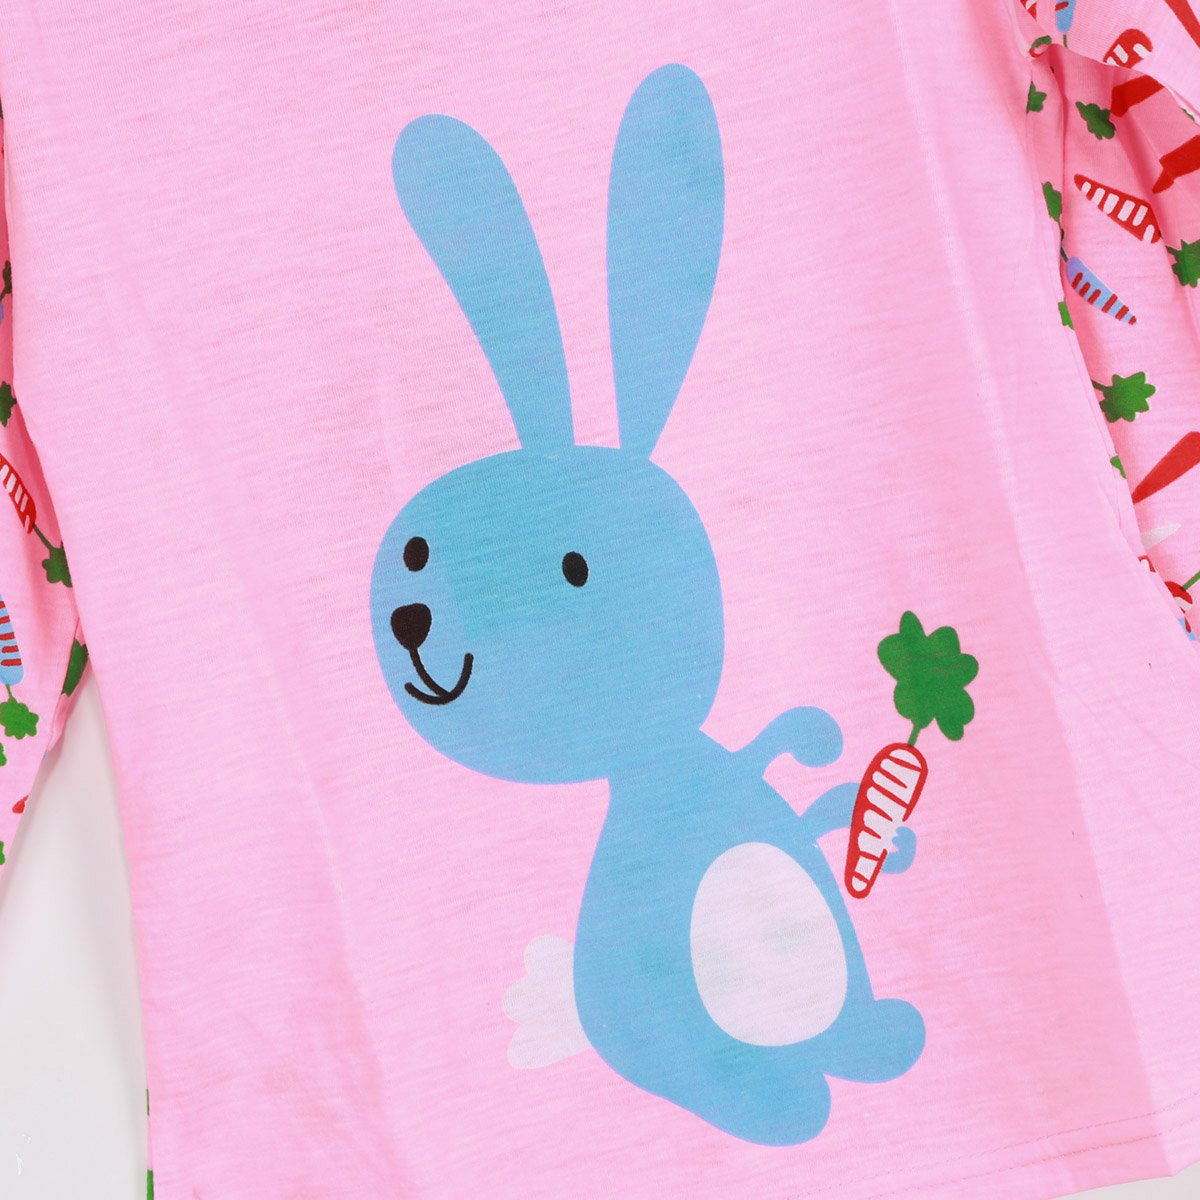 Girls Pajama Sets Cartoon Two Piece Cotton Kid Baby Girl Home Sleepwear Pink-L 4-5 Years